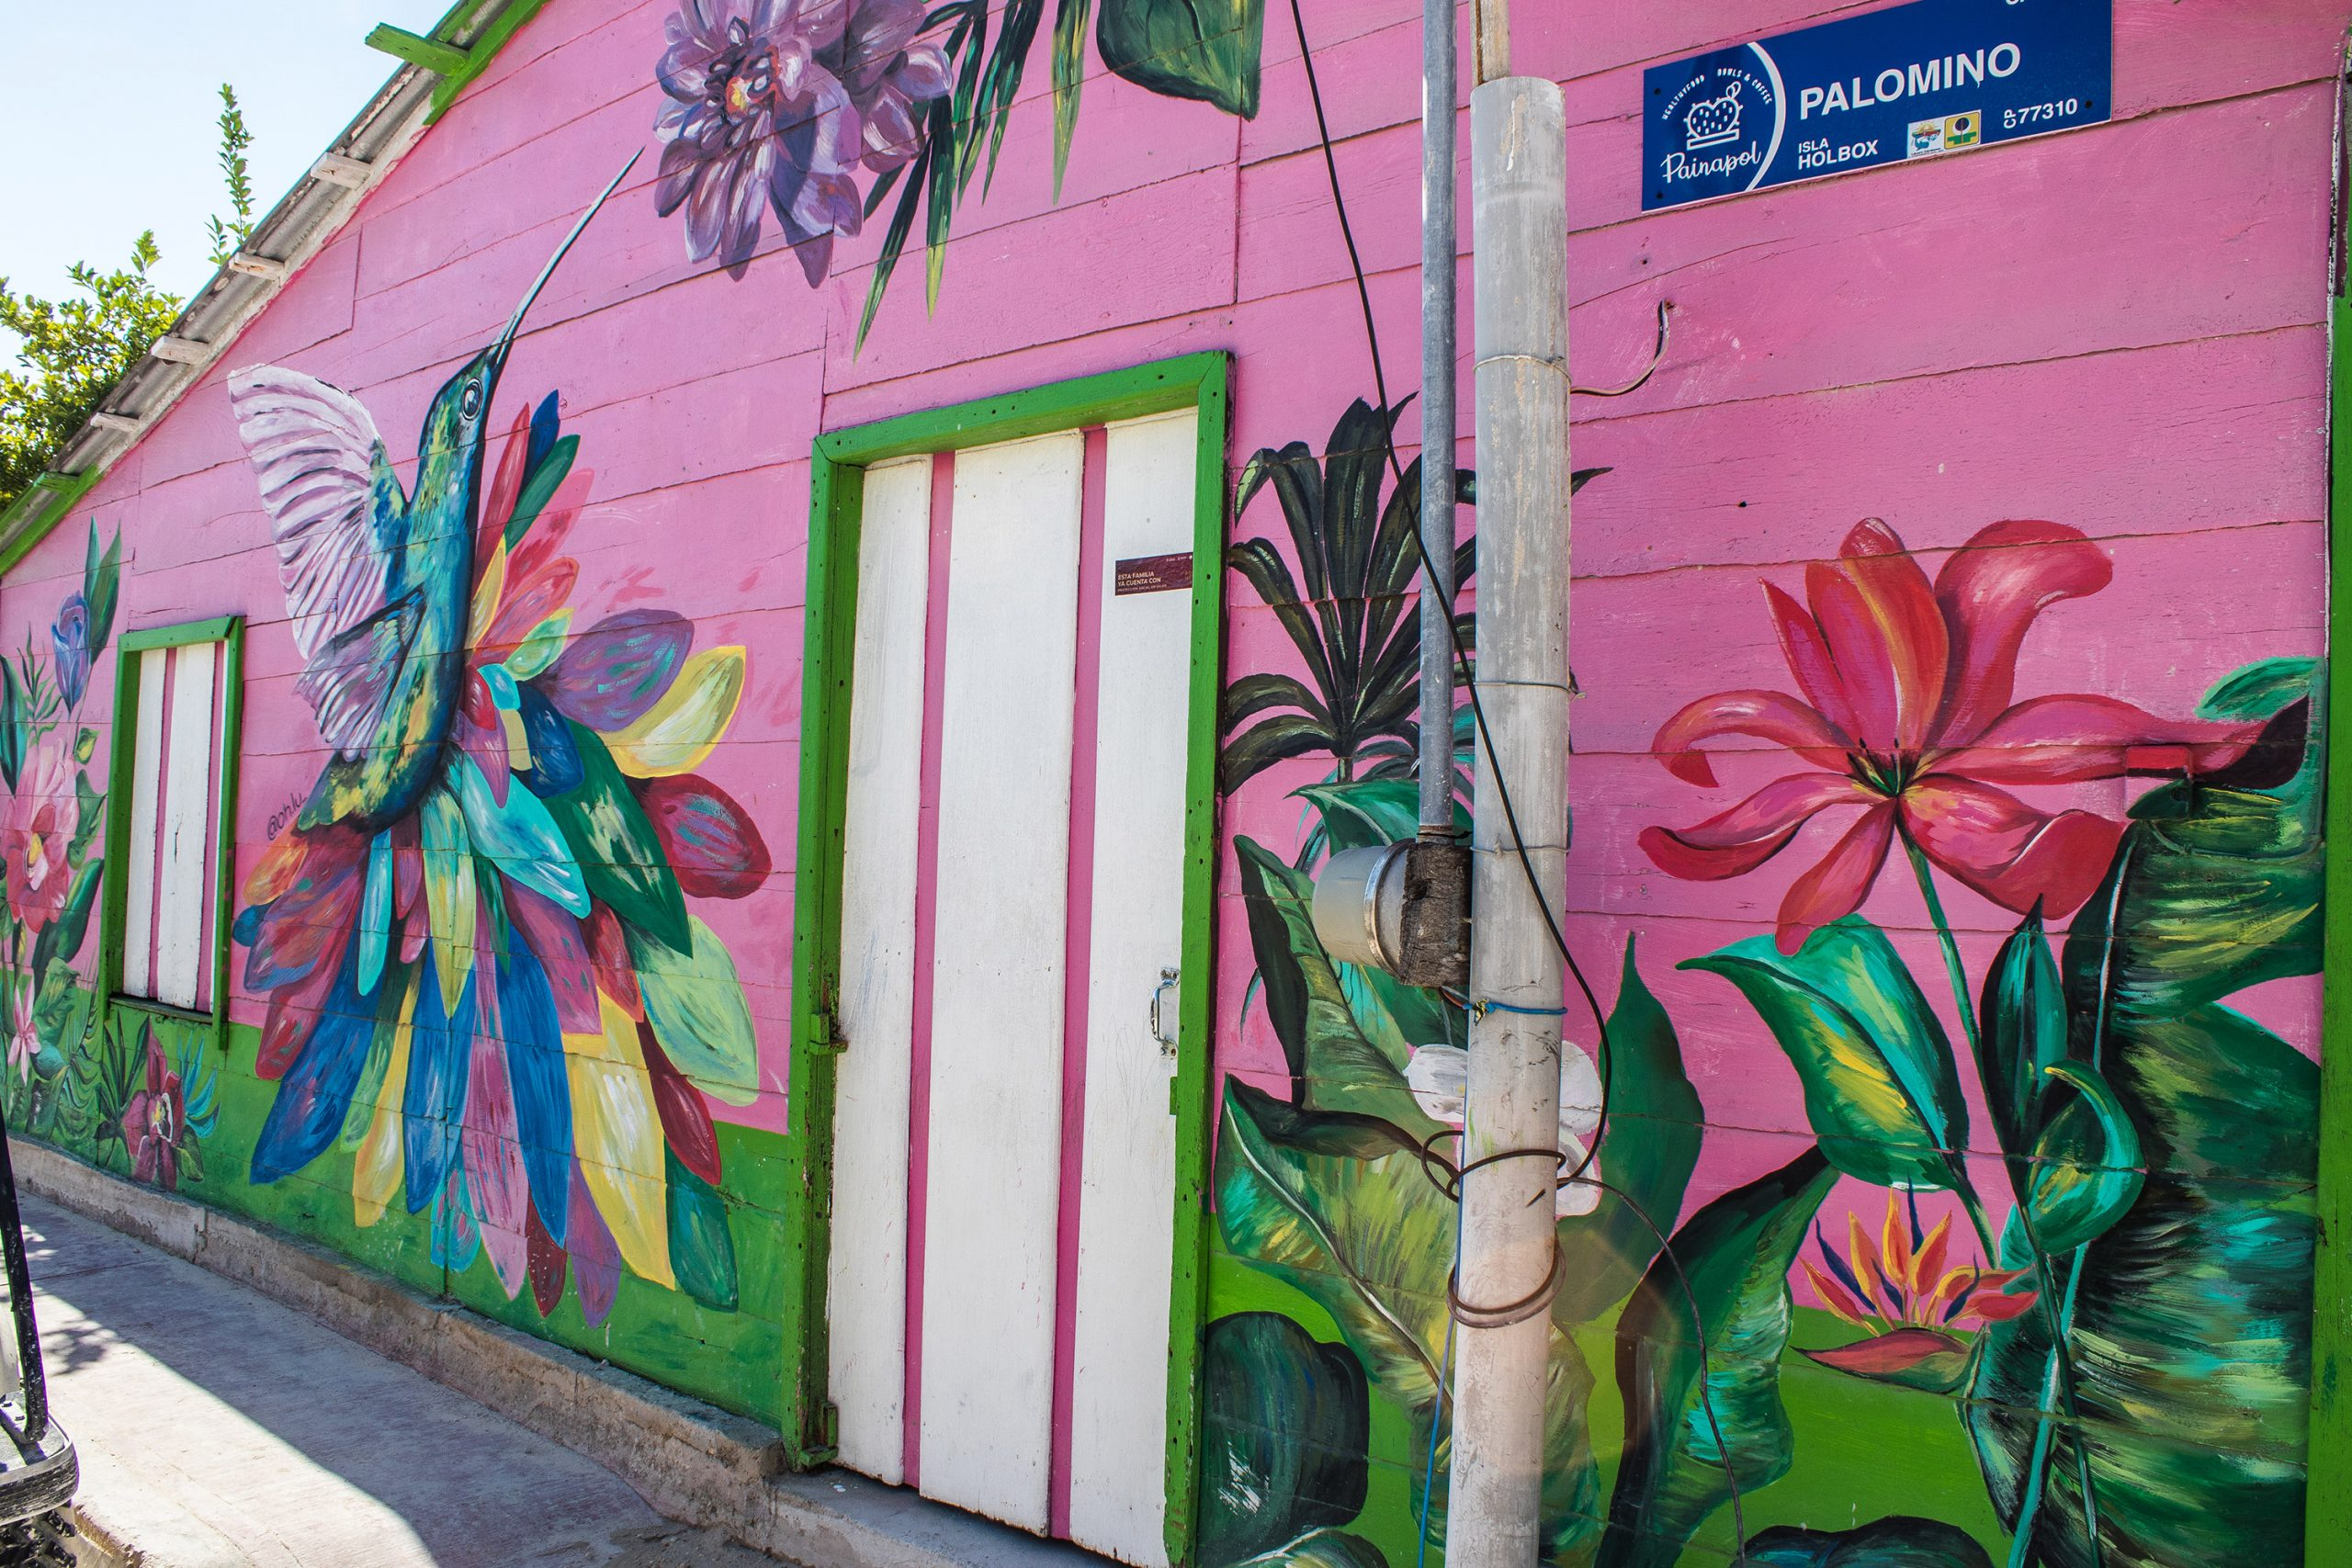 Holbox - Street art - Yucatan - Mexico